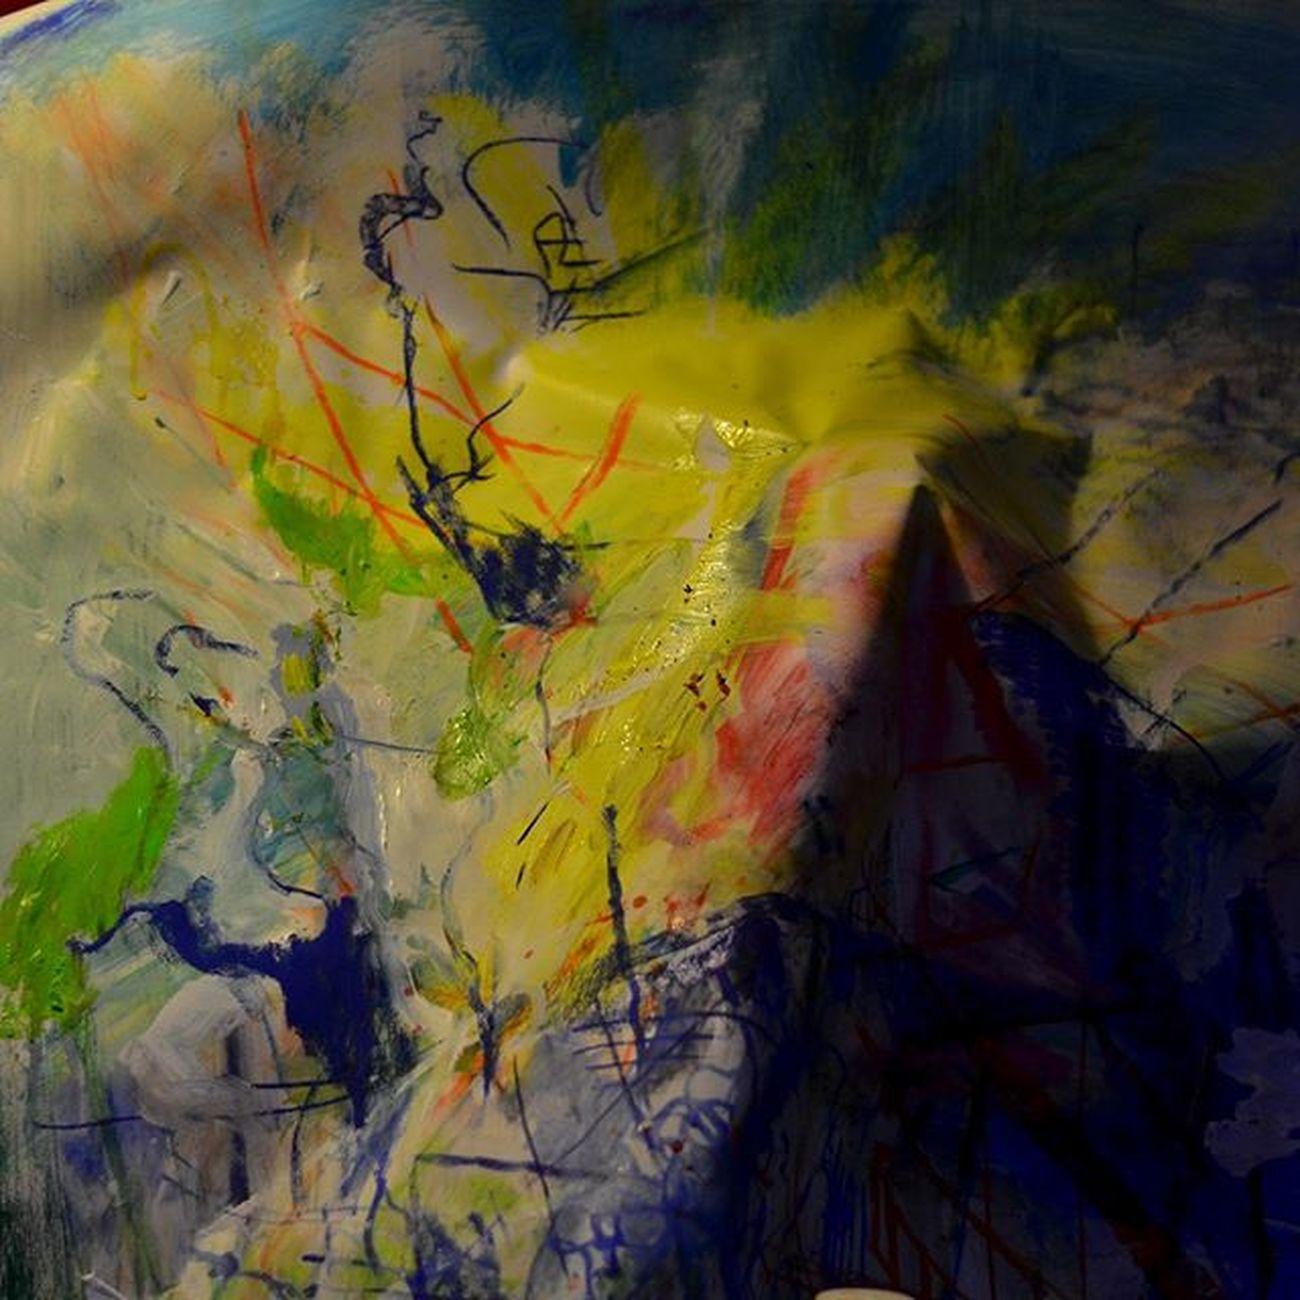 Abstract Abstractart Abstractartist Abstractarts Abstracted Abstractexpressionism Abstractexpressionist Abstraction Abstractors Abstractpainting Workflow Eastsidebrillen Arminpauldrawing Arminpaulpainting Symbol Peace Love Instamood Instalike Instapic Instapaint Instalove Abstractexpressionism Abstractartist Abstractlove dark loveart berlin miami tokyo berlinart